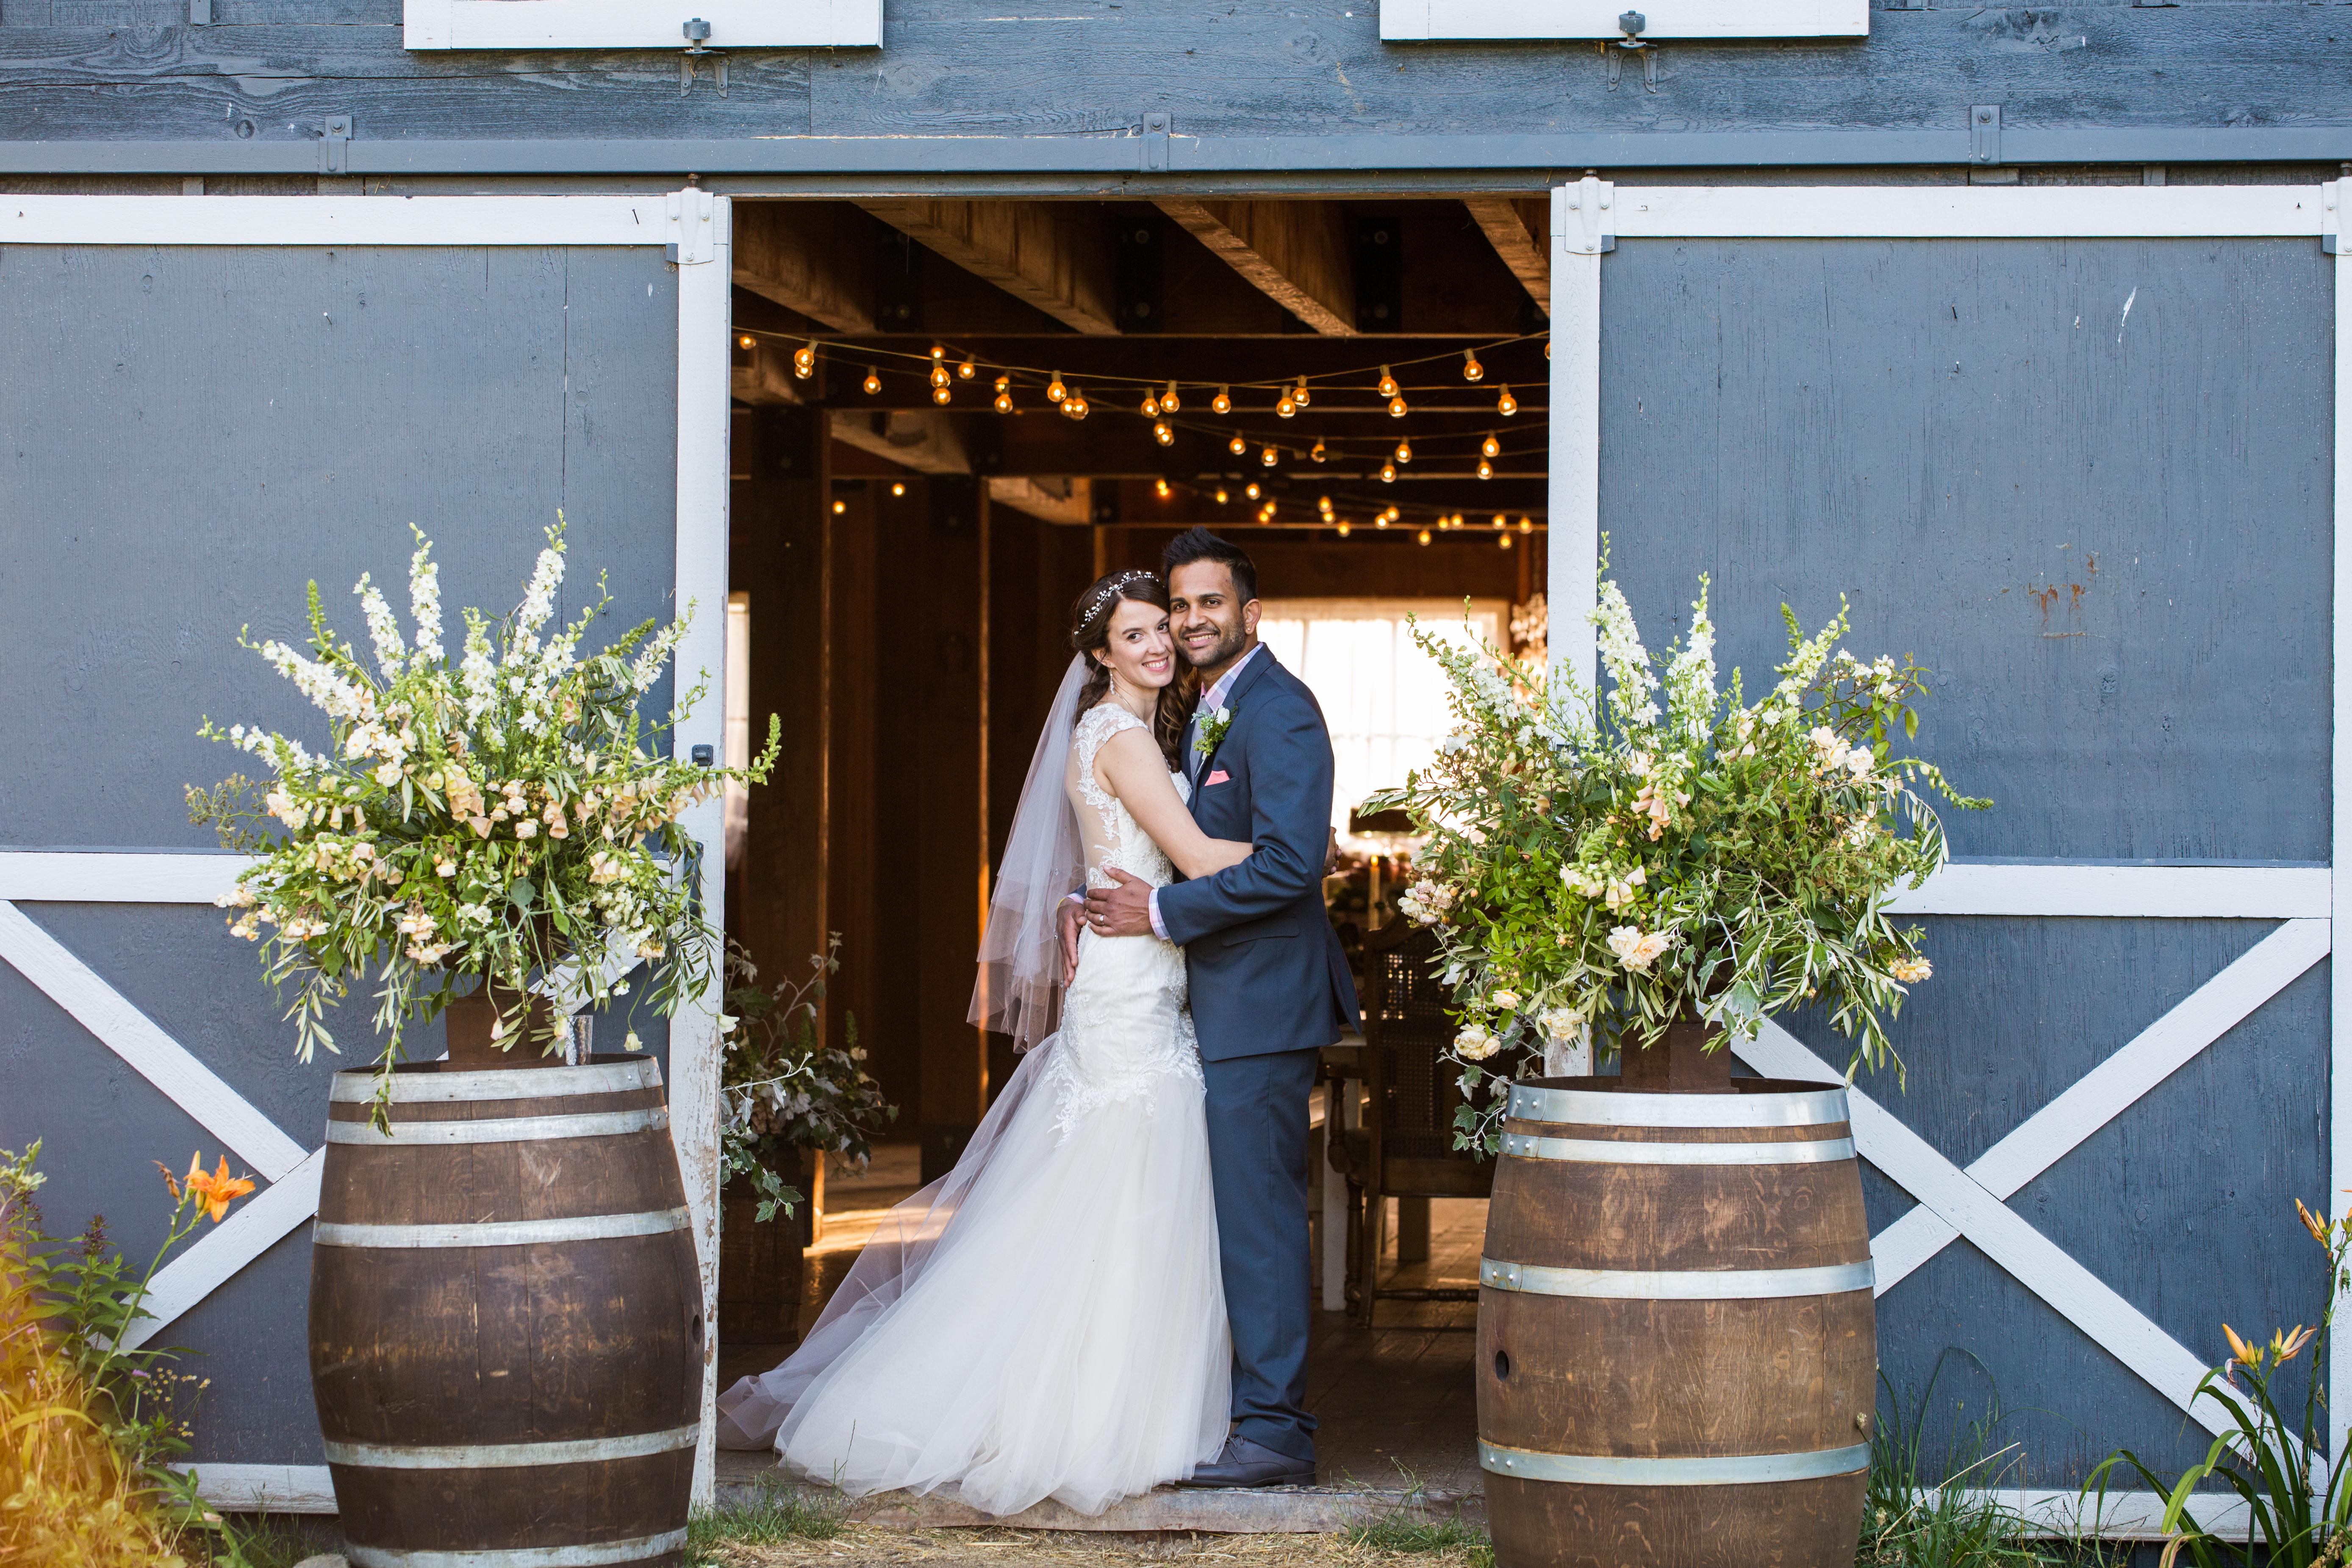 Rustic Barn Wedding on Bainbridge Island - Robert Evans Studios